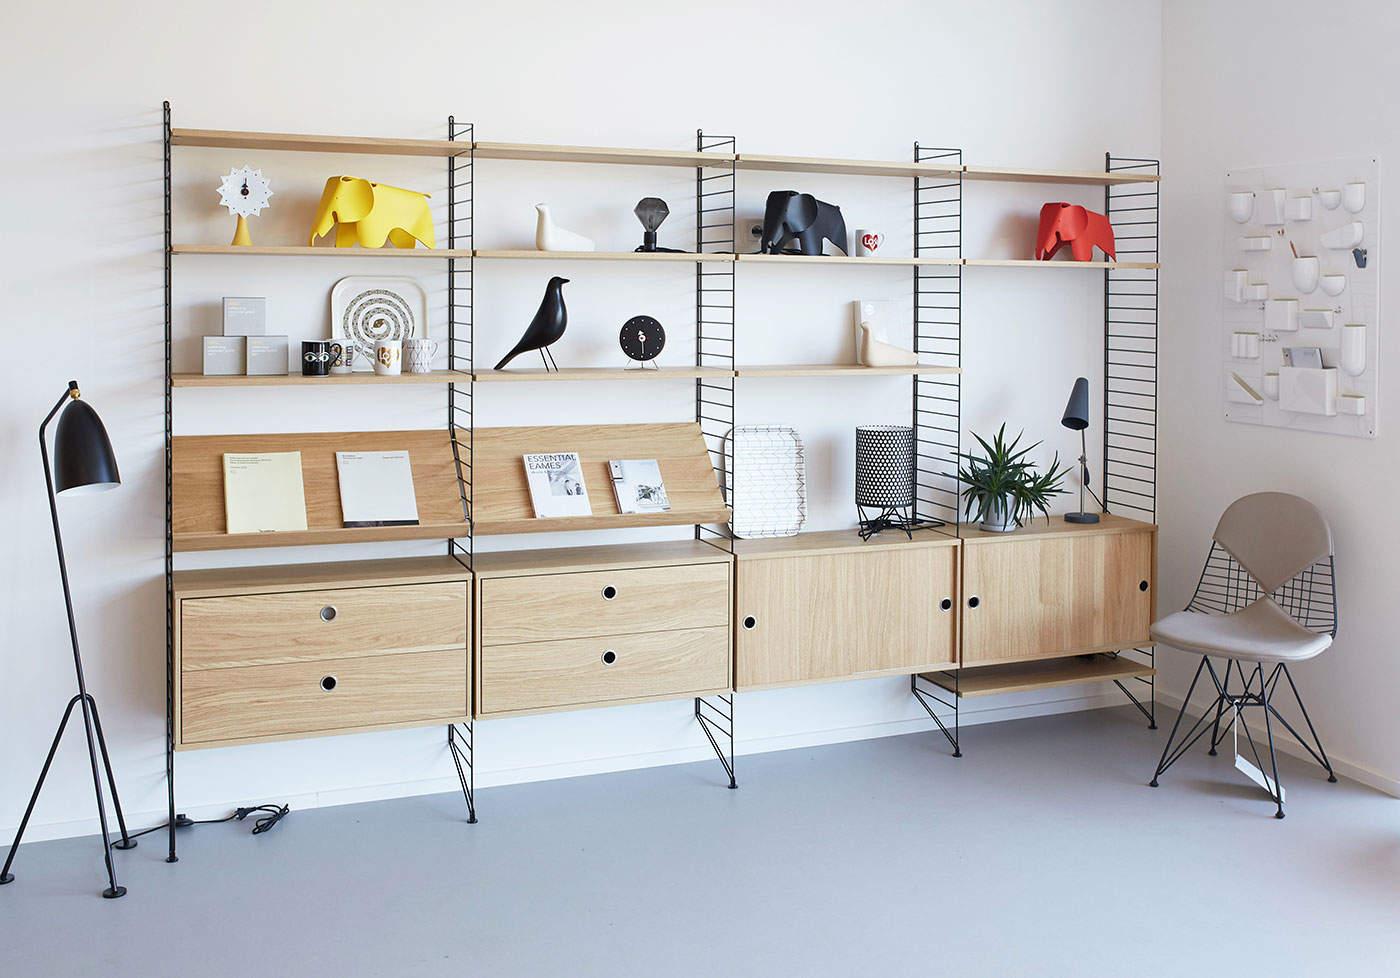 Policový systém String v showroomu DesignVille